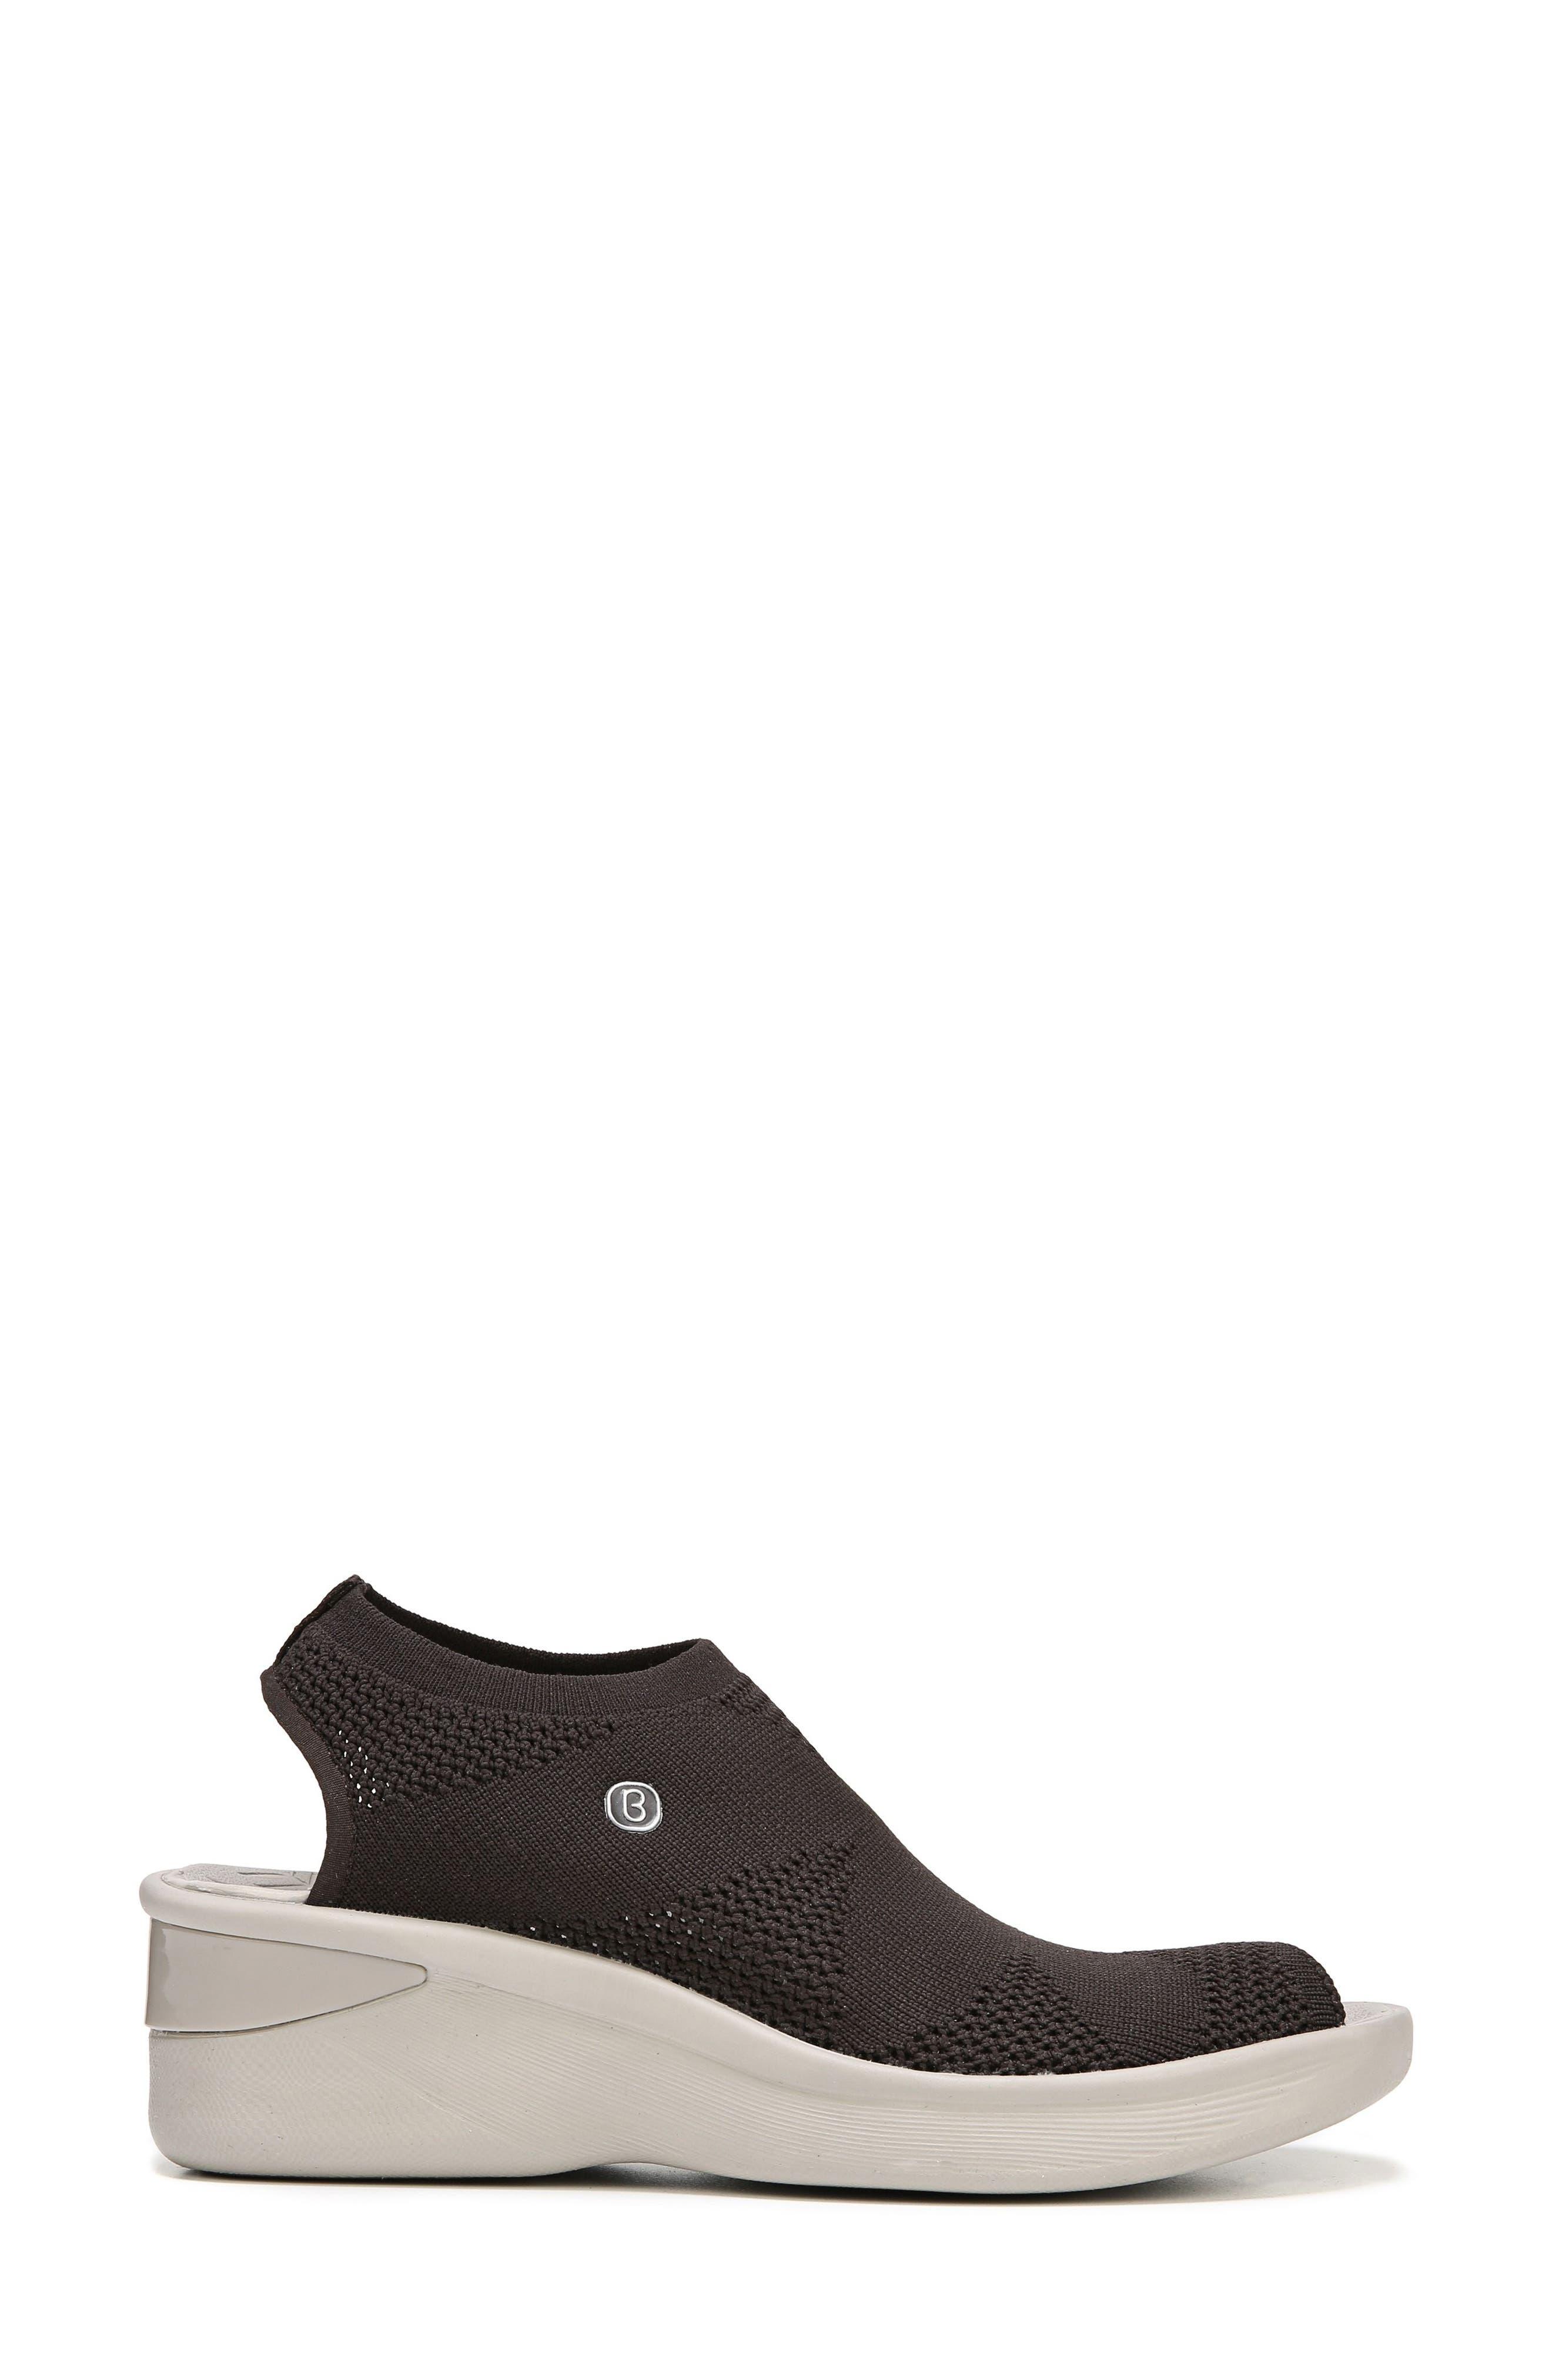 Secret Peep Toe Knit Sneaker,                             Alternate thumbnail 3, color,                             BROWN FABRIC